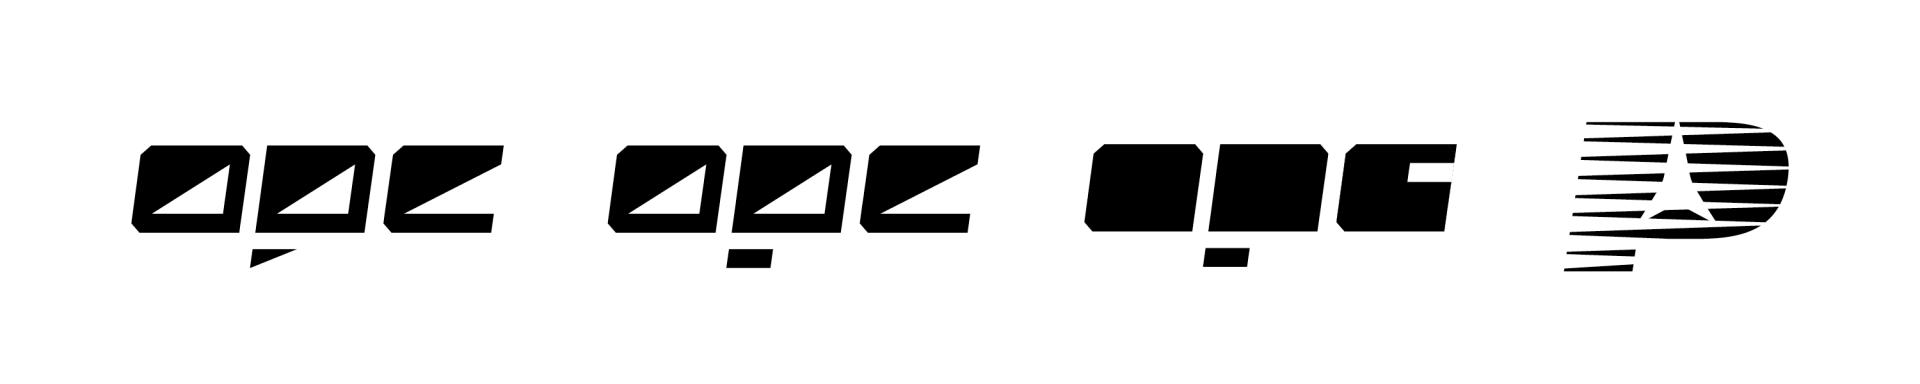 Grafikum Logos, icons and illustrations